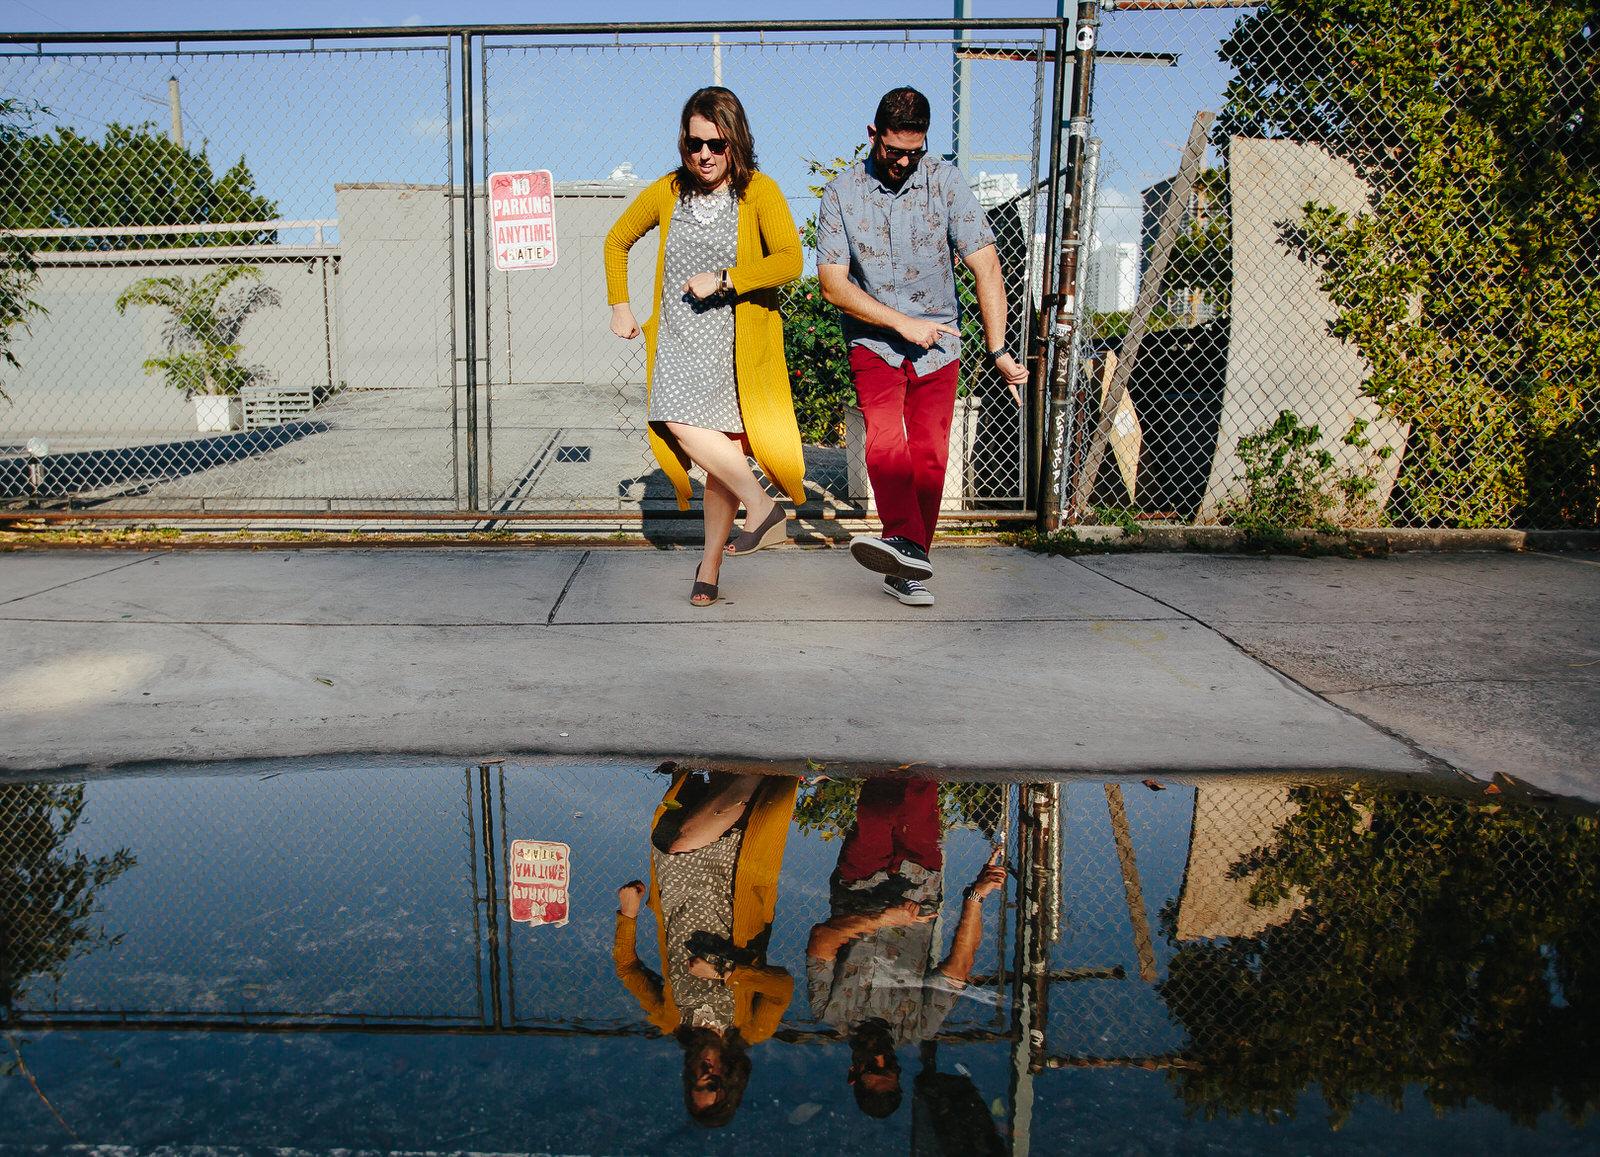 couple_dancing_miami_florida_reflection_fun_tiny_house_photo.jpg